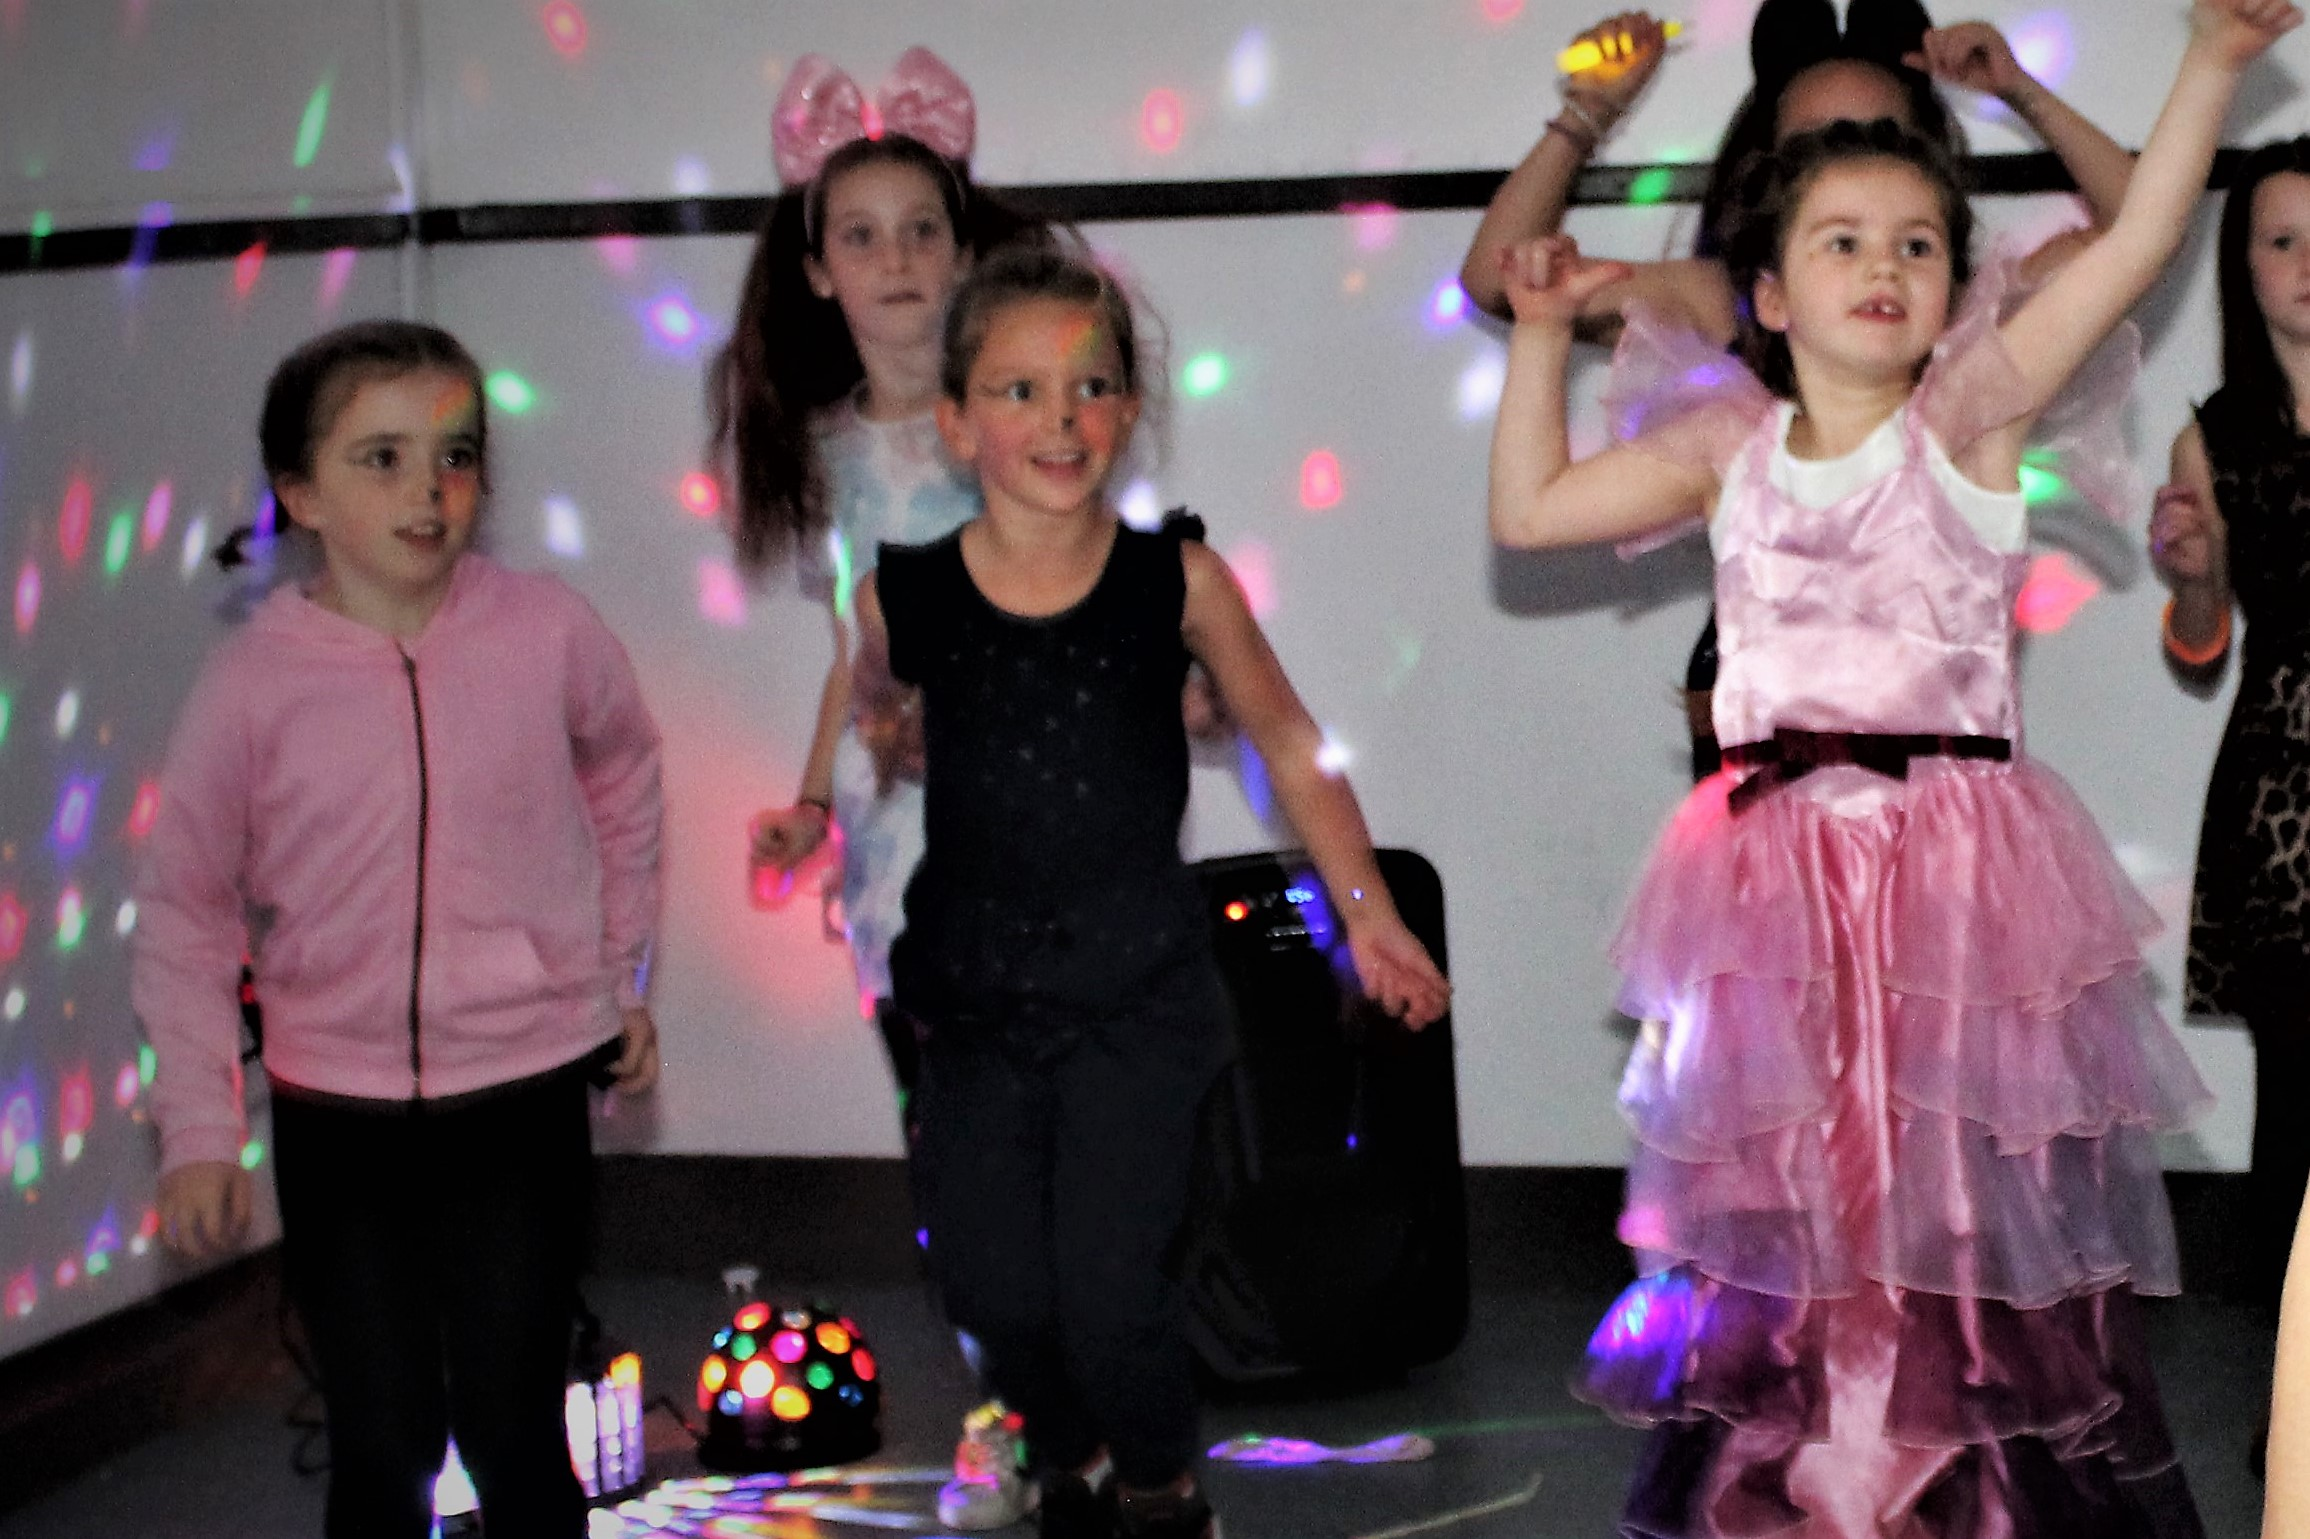 Princess fun kids party (2).JPG